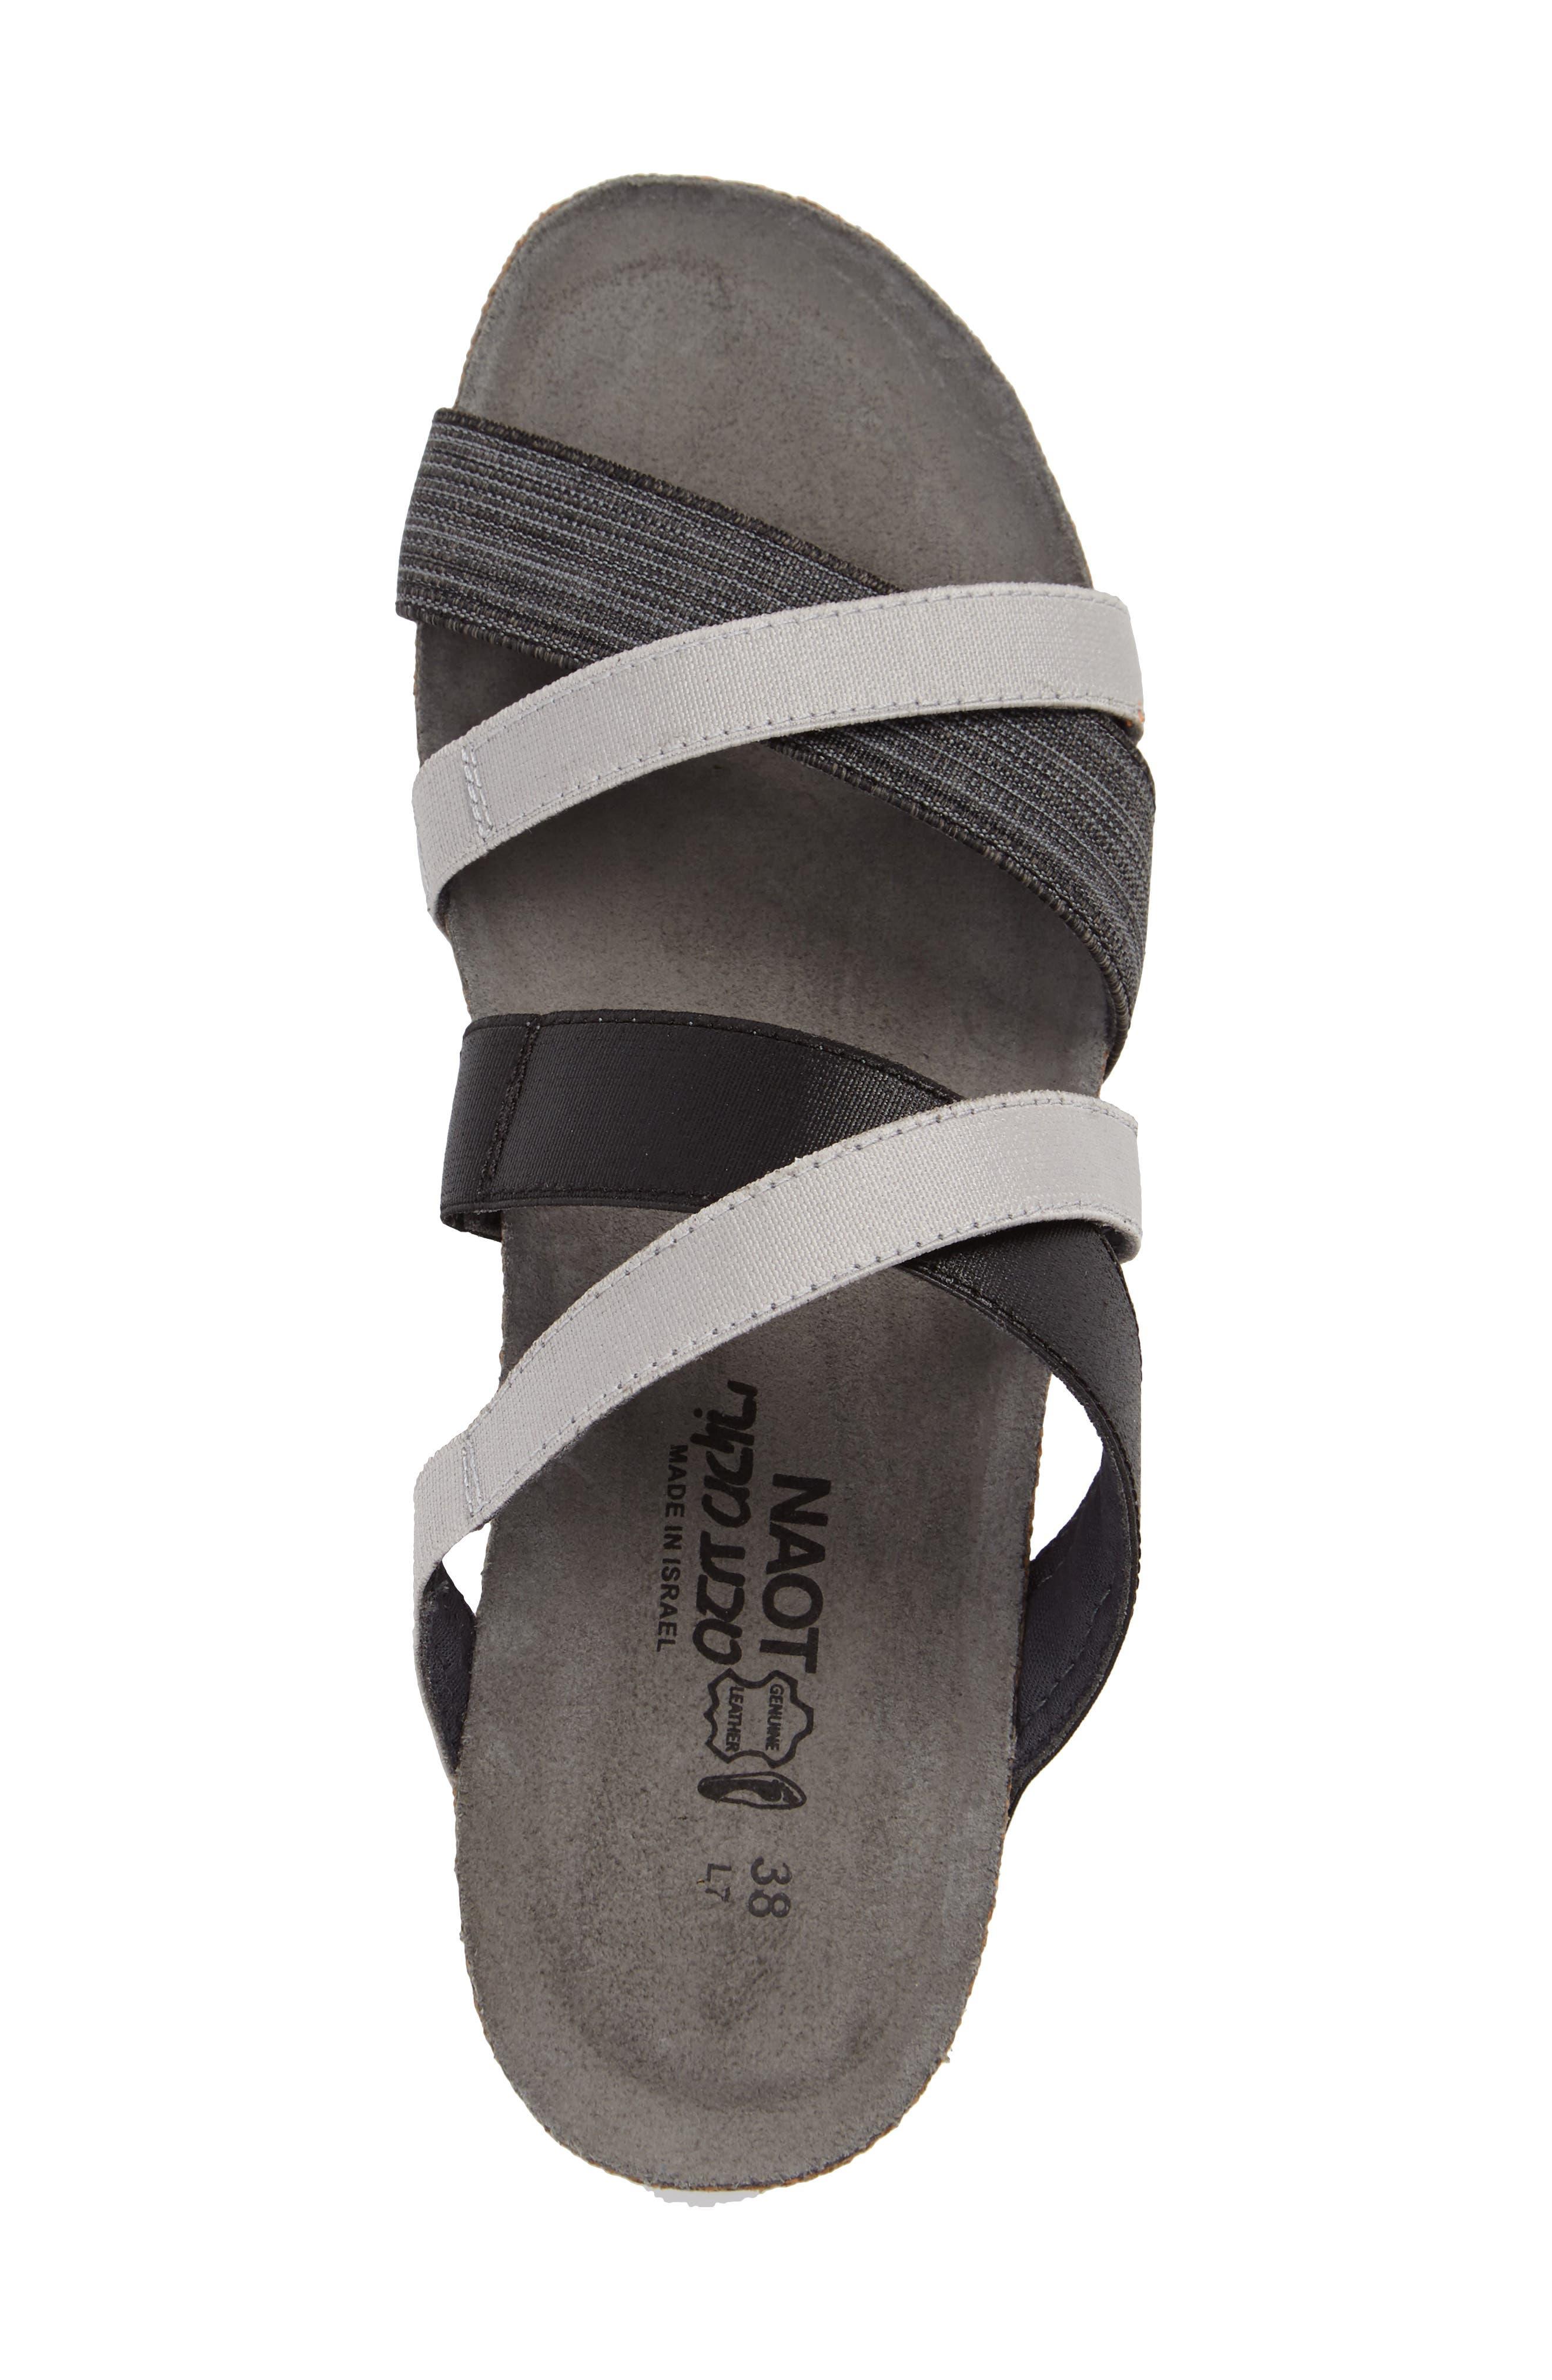 Roxana Strappy Slip-On Sandal,                             Alternate thumbnail 3, color,                             BLACK/ GREY FABRIC